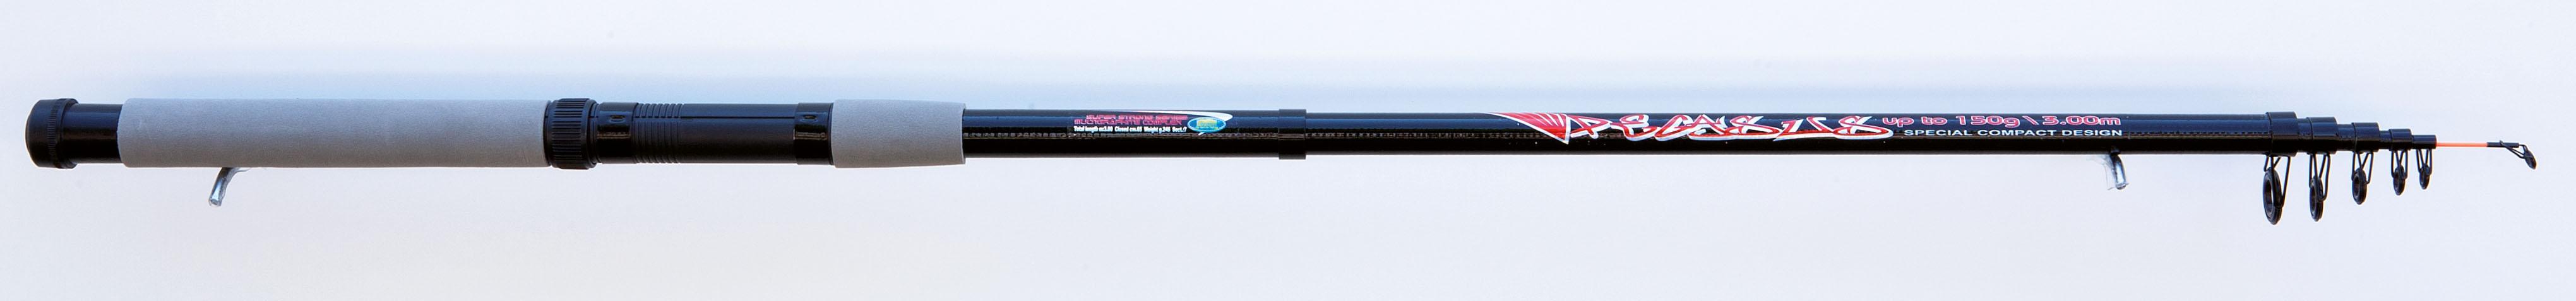 Prut teleskopický VIGOR PEGASUS Gramáž: 50-150 gr, Počet dílů: 6, Délka prutu: 240 cm, Skladnost prutu: 55 cm